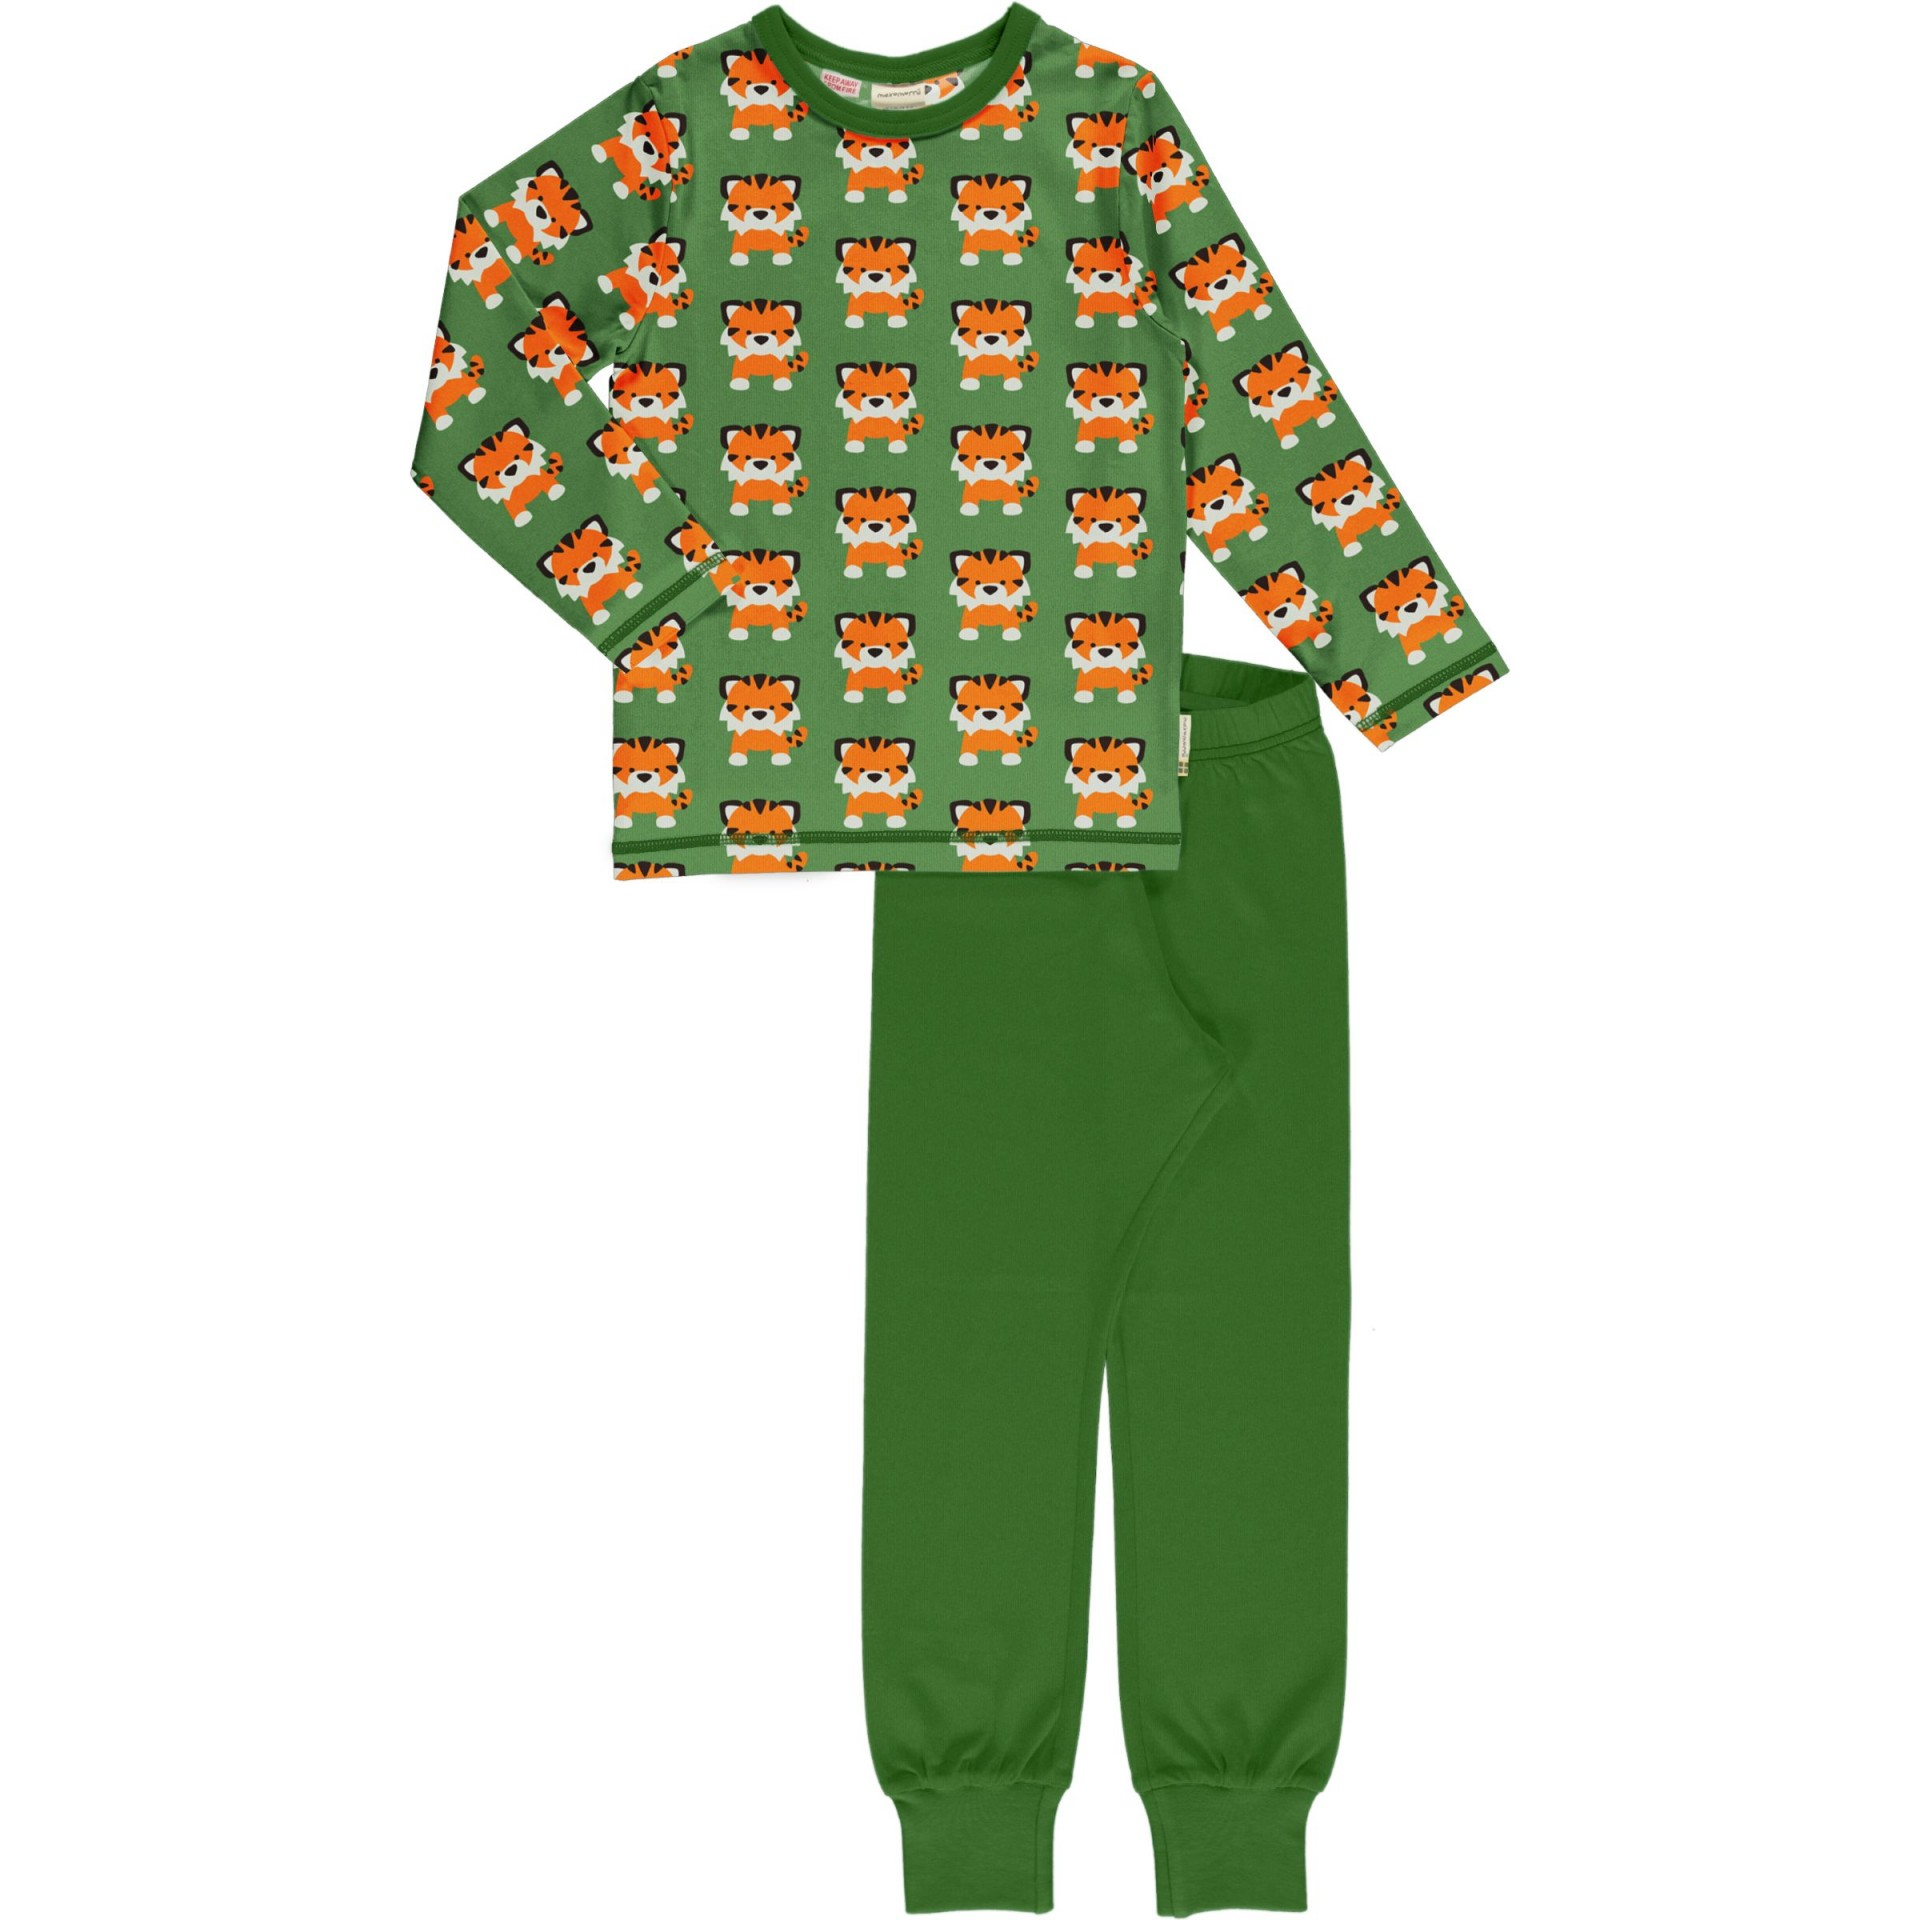 Pijama TANGERINE TIGER Maxomorra (Tamanhos disponíveis 9-12 m, 18-24m )